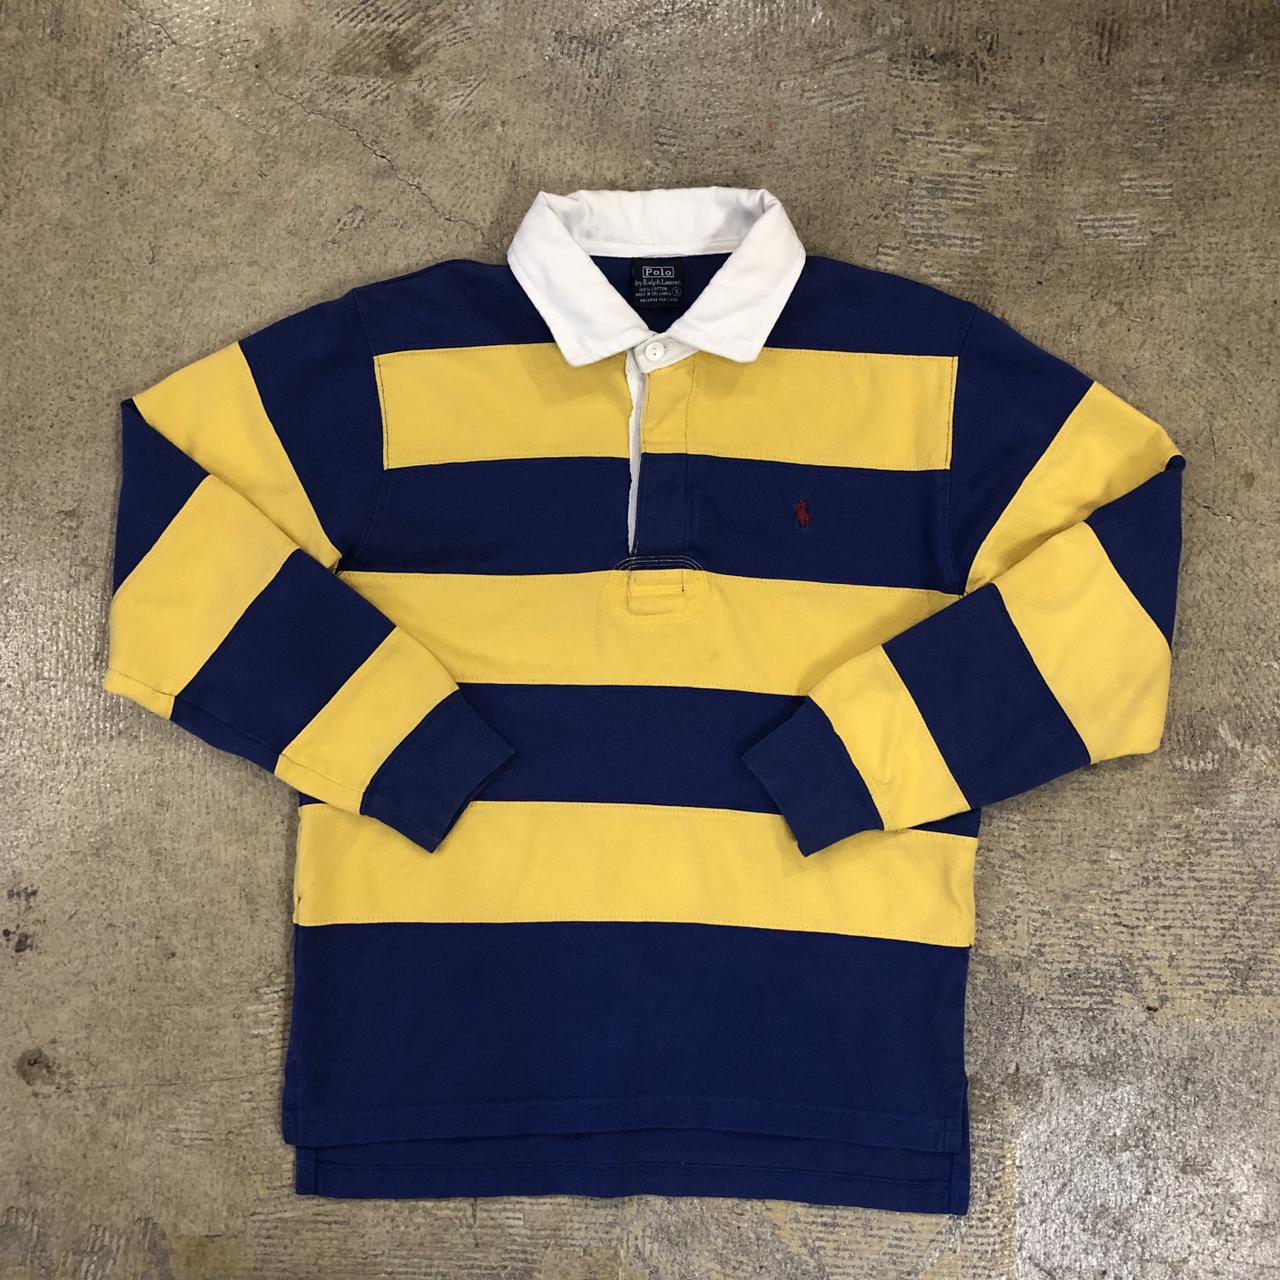 Polo Ralph Lauren Rugby Shirts ¥5,400+tax